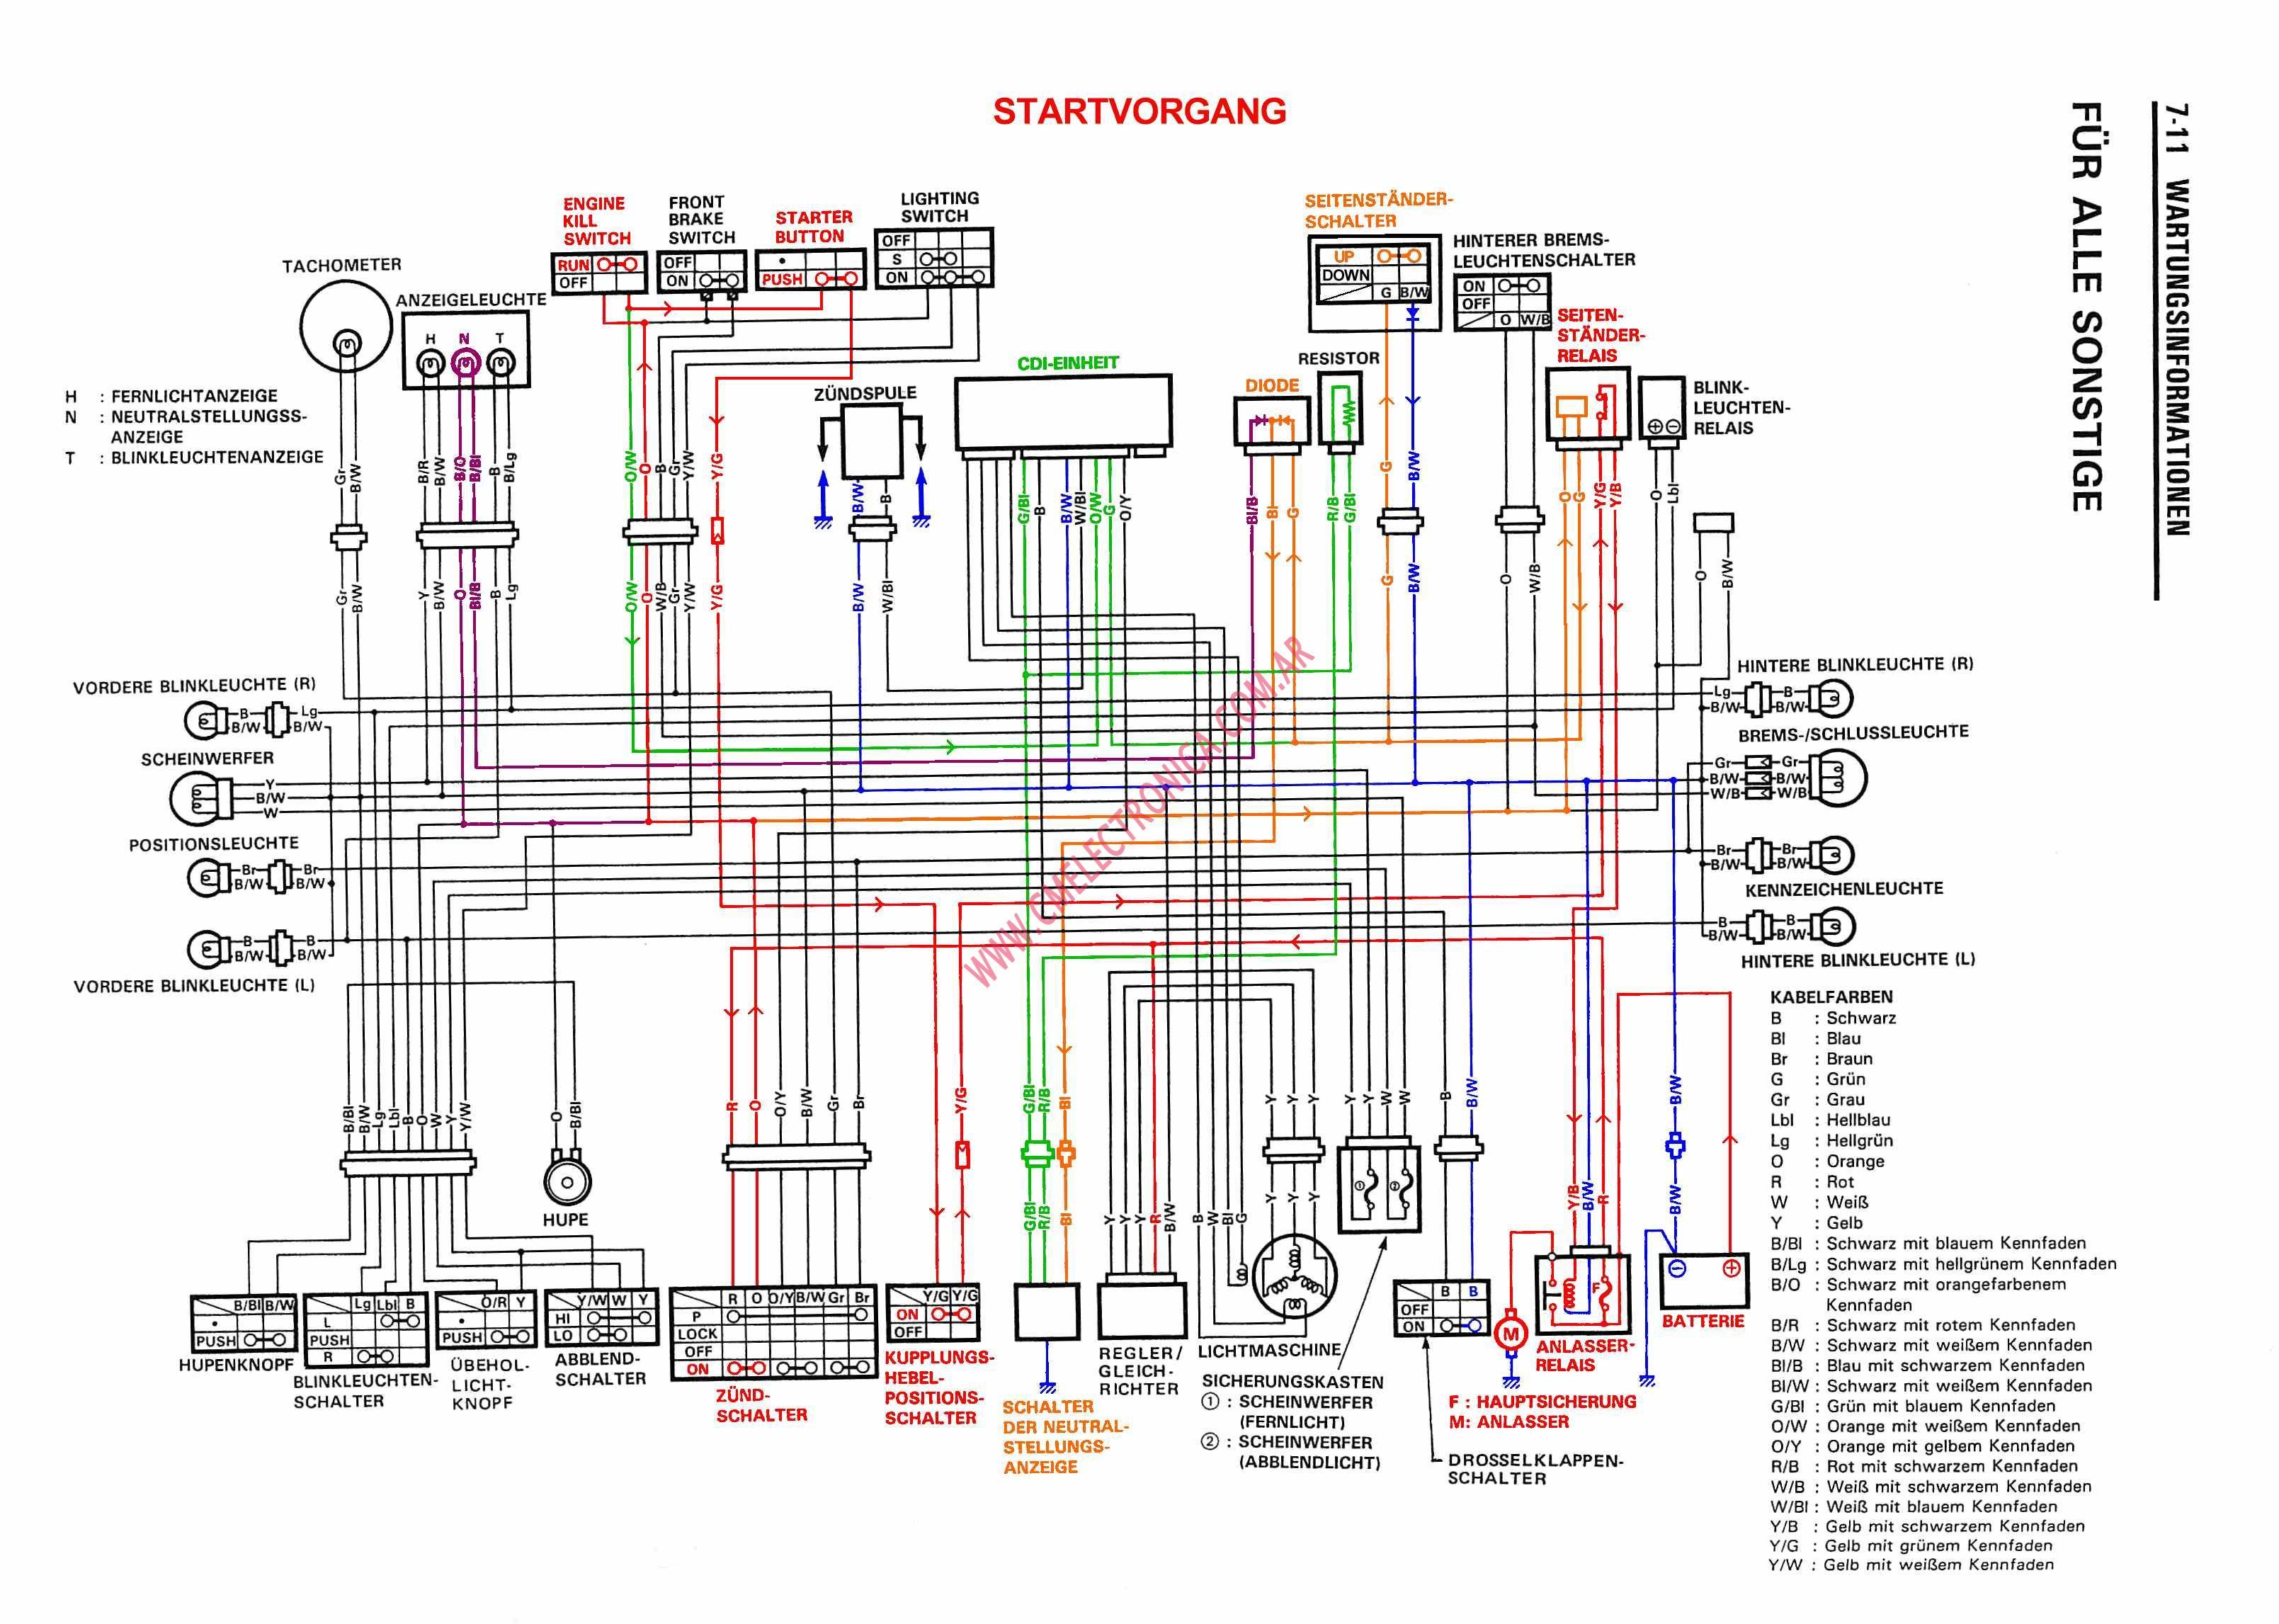 Dr 200 Wiring Diagram Dr 200 Wiring Diagram - Wiring Diagrams